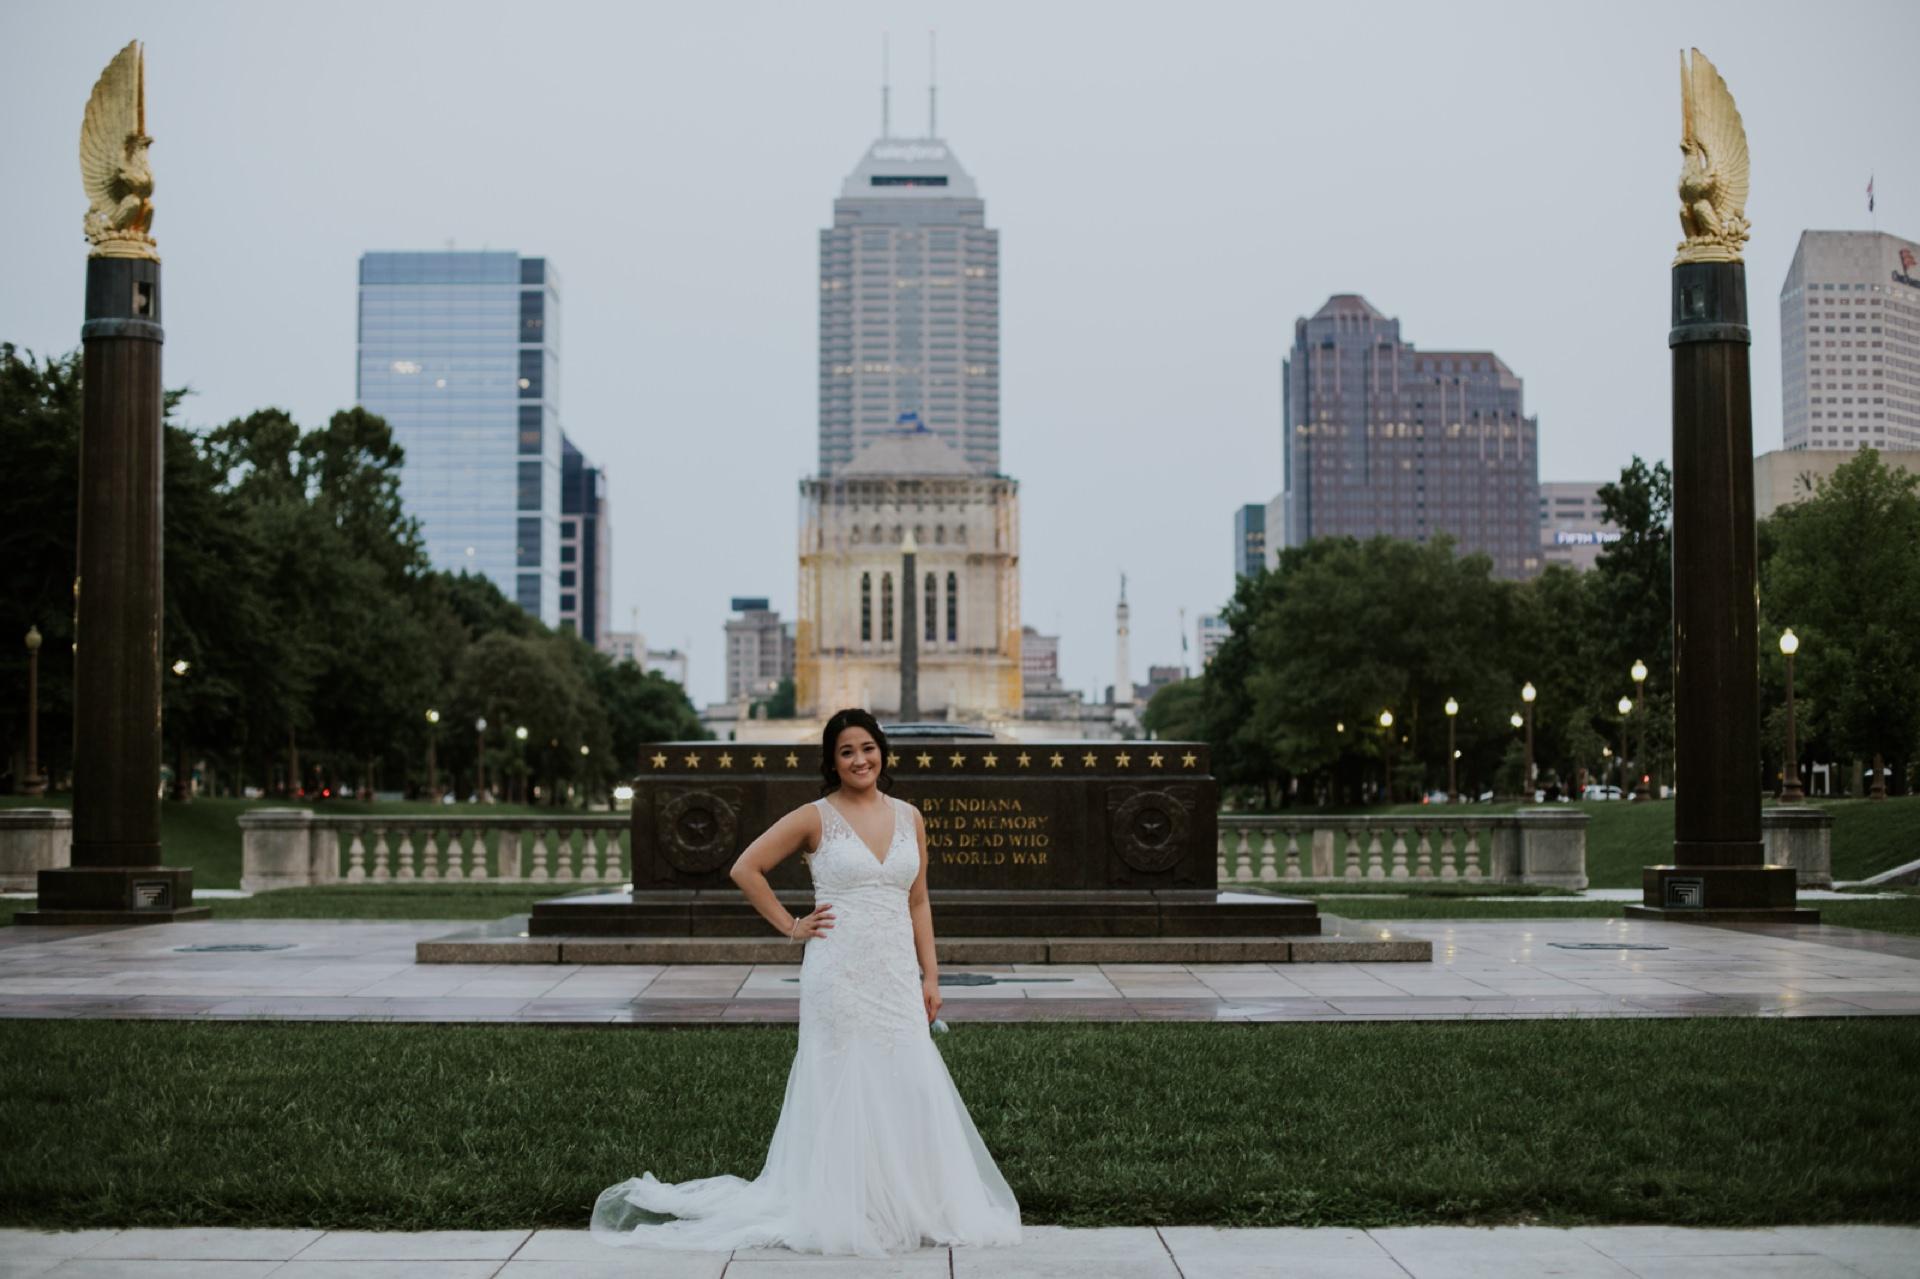 Indianapolis-Public-Library-Wedding_085.jpg